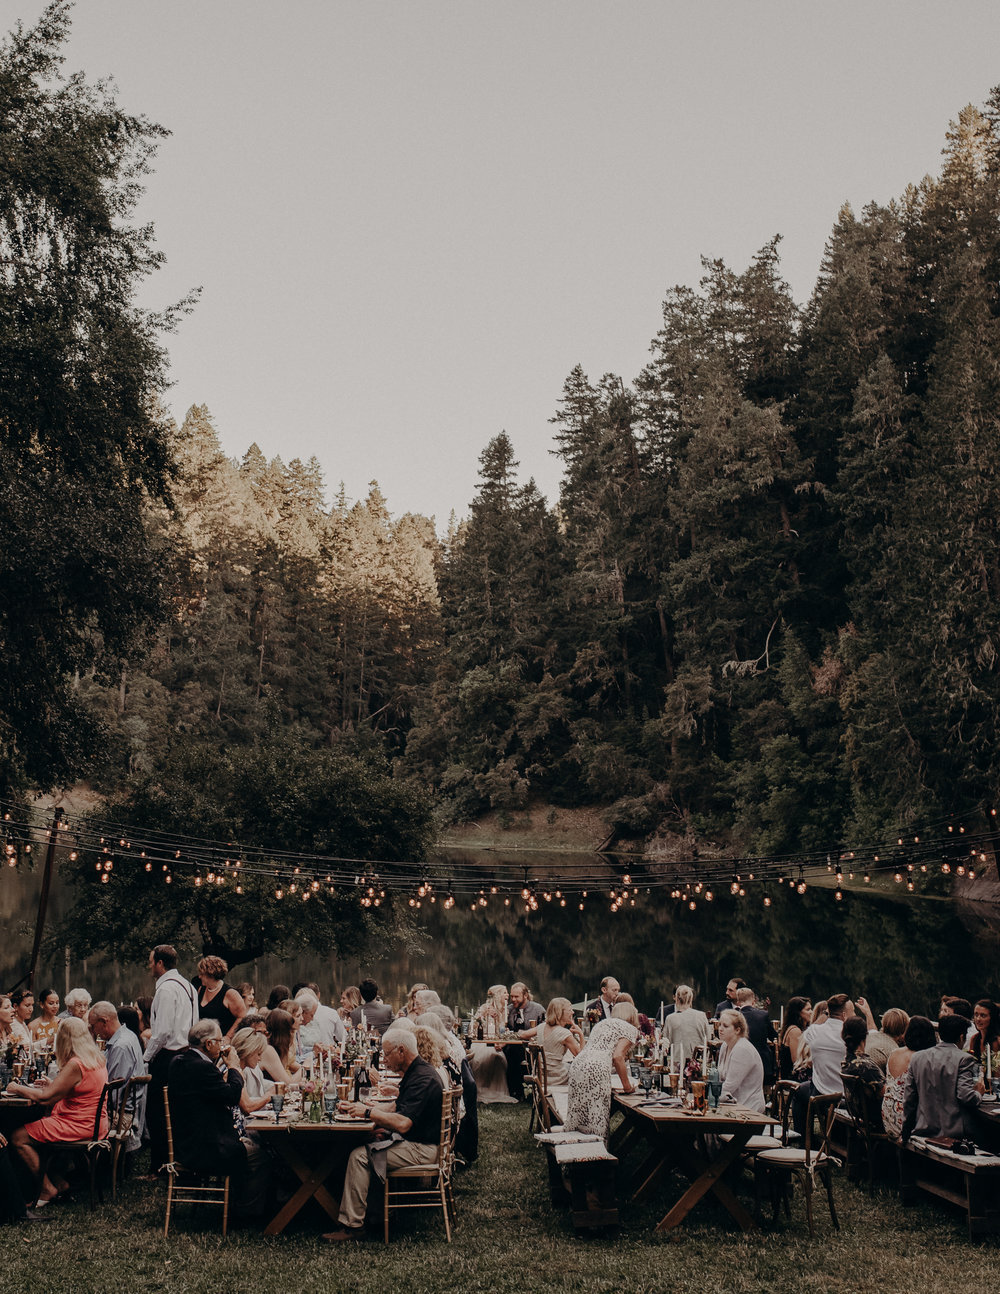 IsaiahAndTaylor.com - California Destination Elopement, Lake Leonard Reserve Wedding, Ukiah-188.jpg